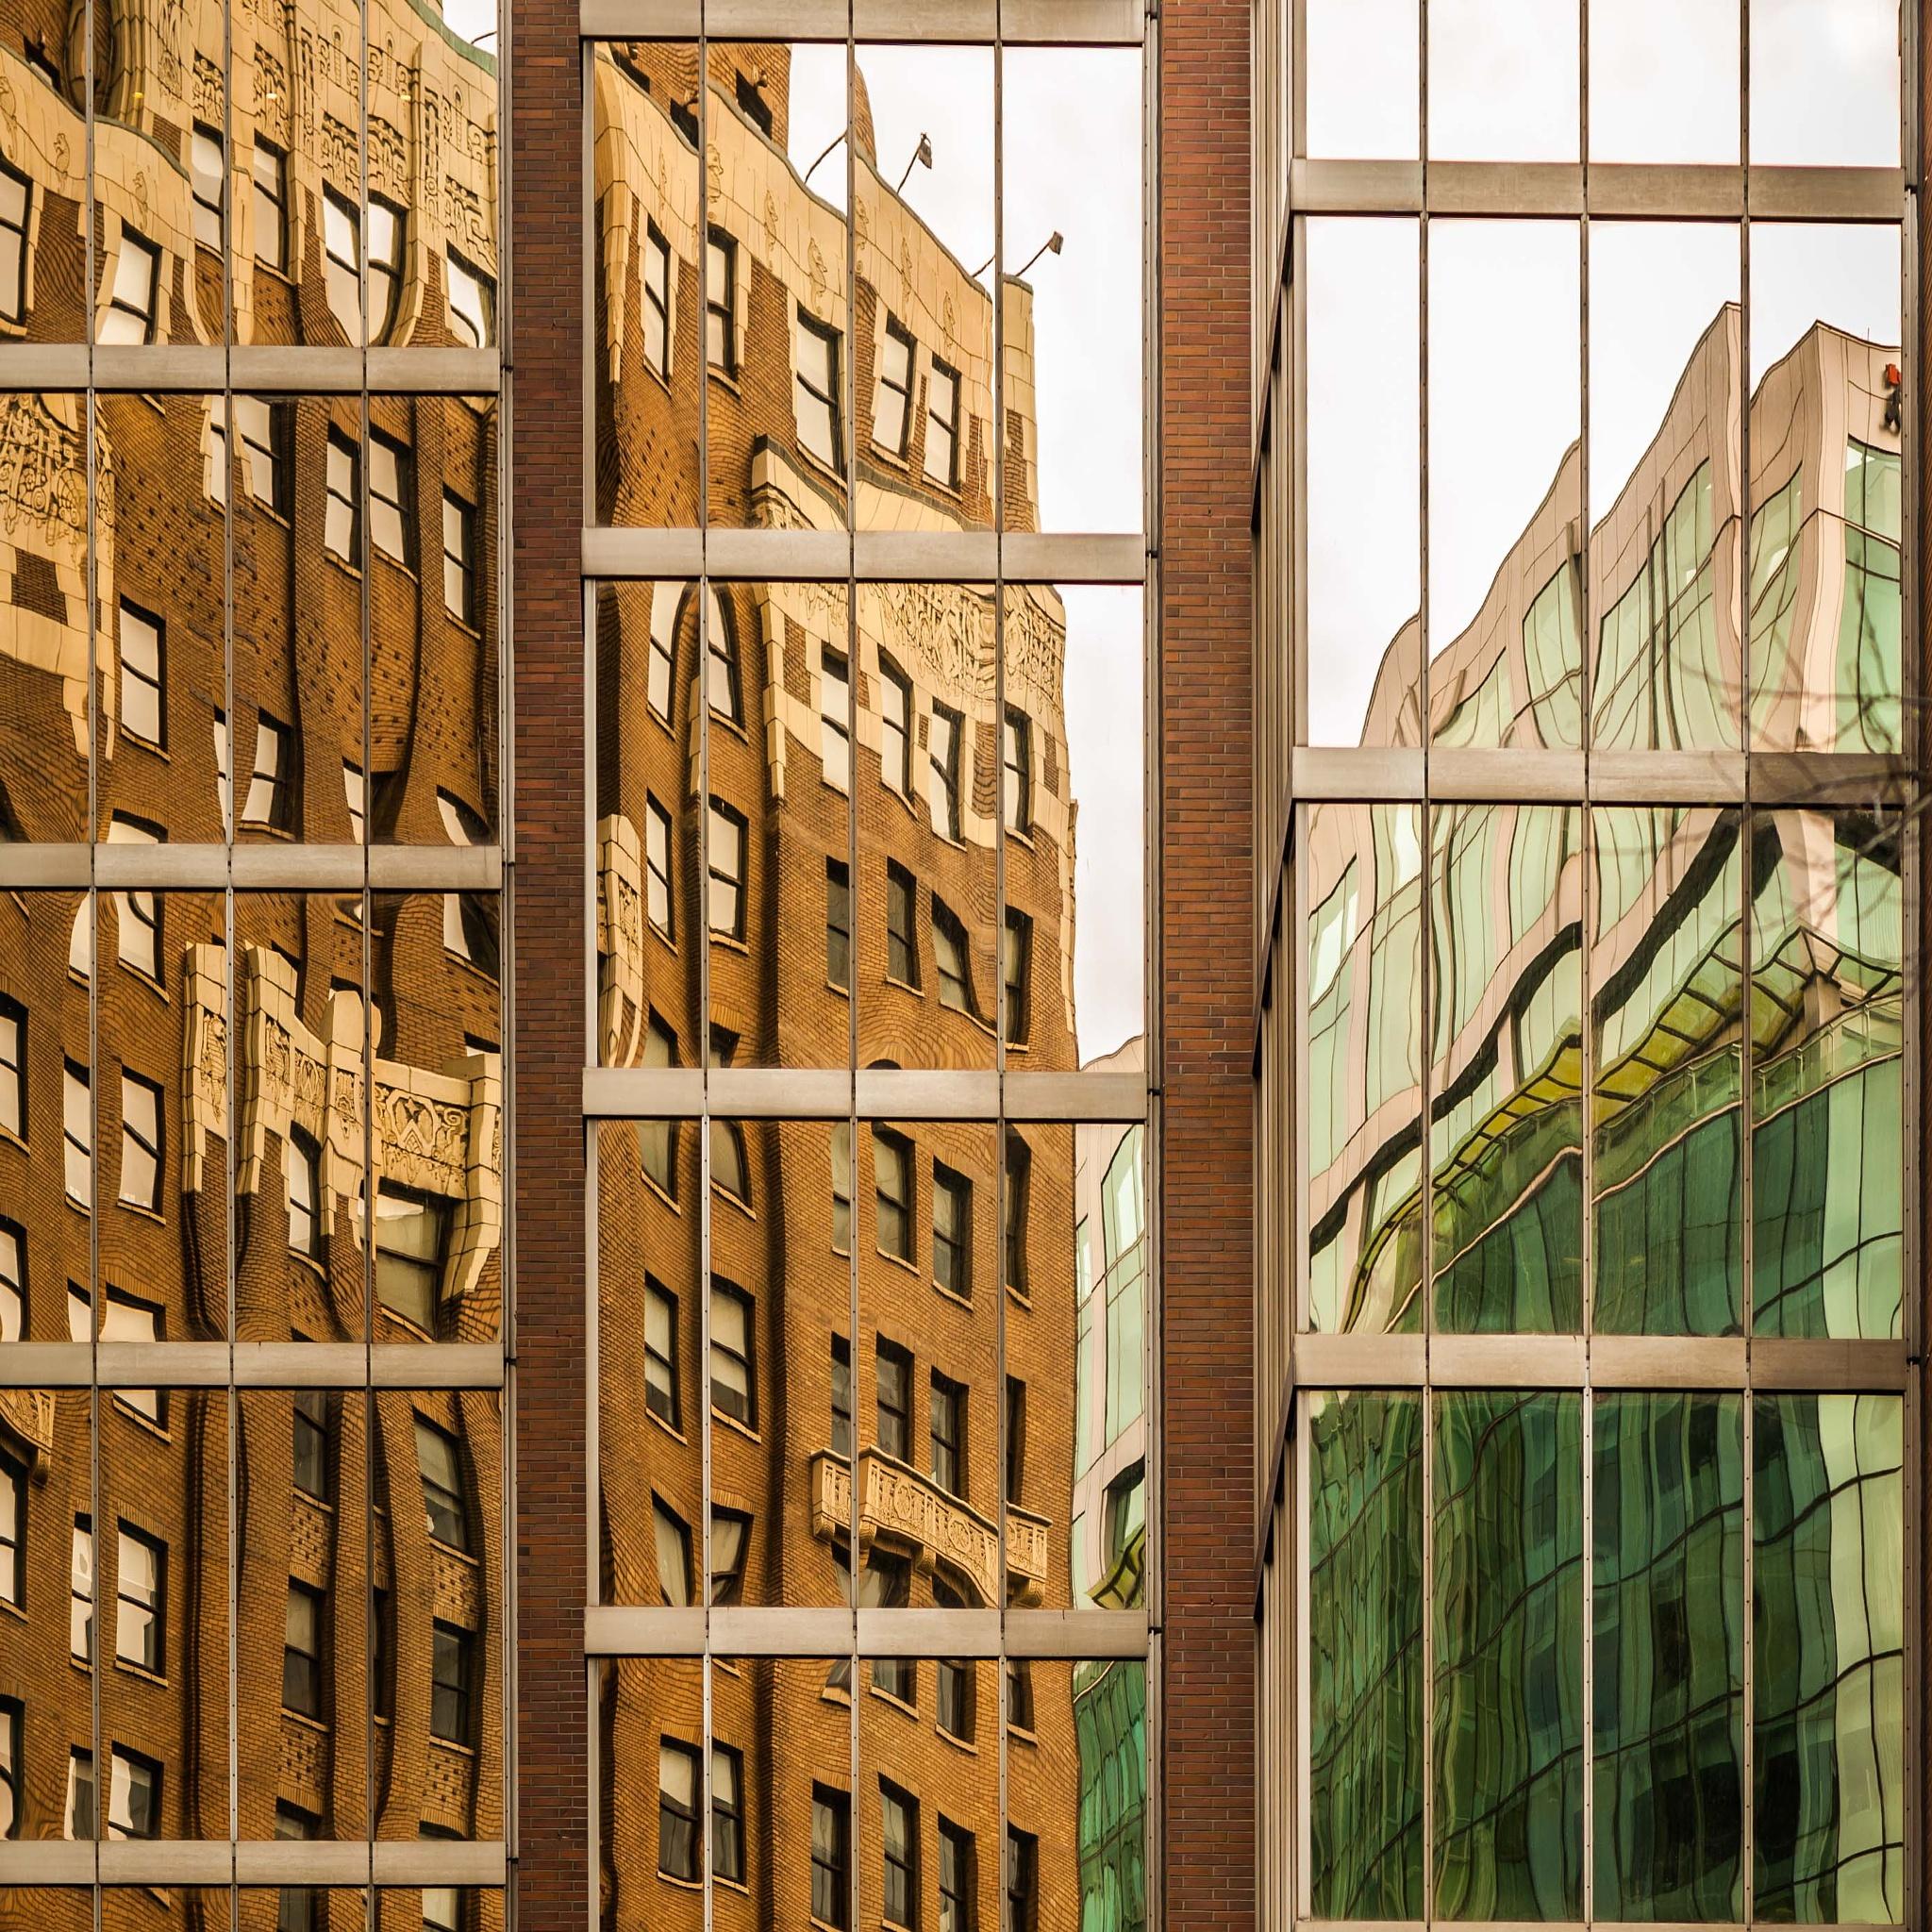 Three Buildings by gldosa